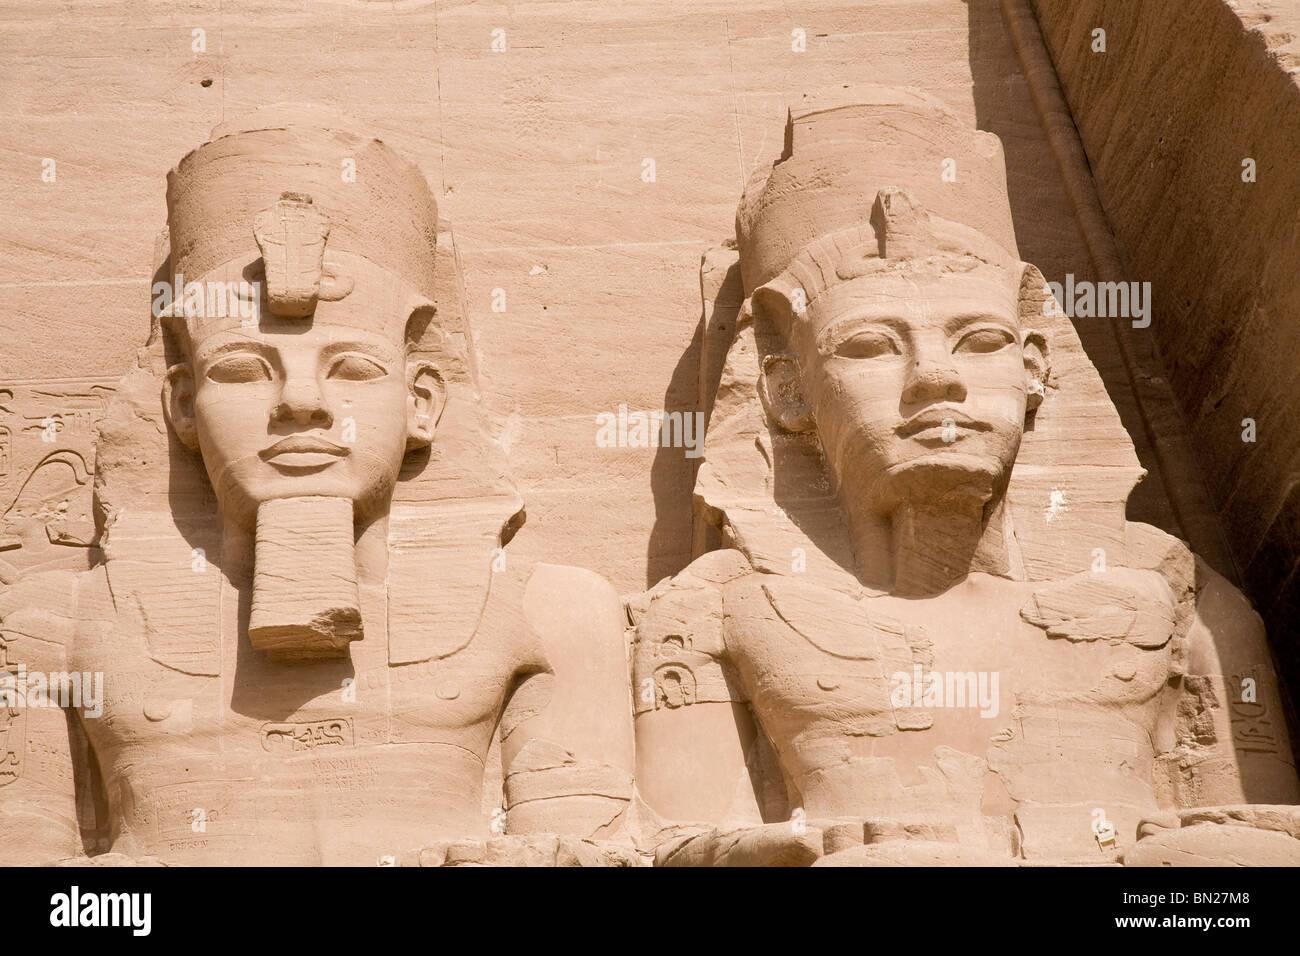 Statues of Ramses 11 outside the entrance of Abu Simbel - Stock Image